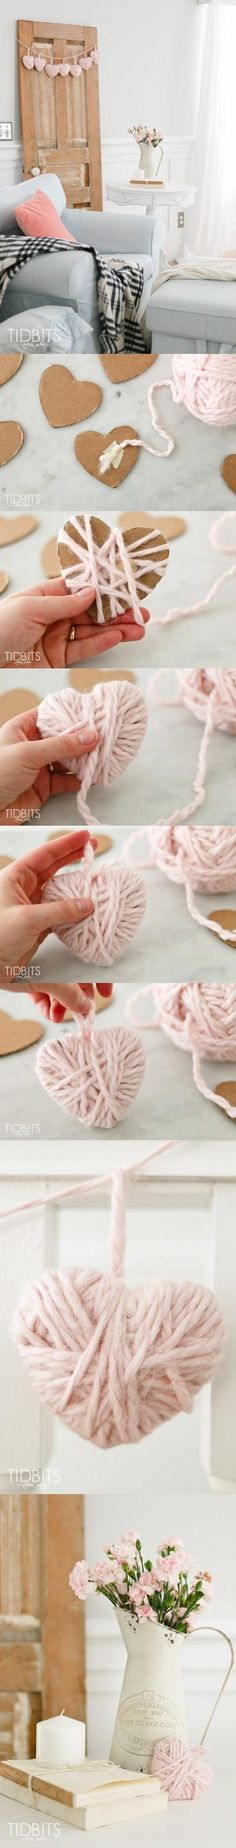 DIY your photo charms, 100% compatible with Pandora bracelets. Make your gifts special. Make your life special! DIY Valentine Yarn Heart - tidbits-cami.com - Decora con corazones de lana DIY